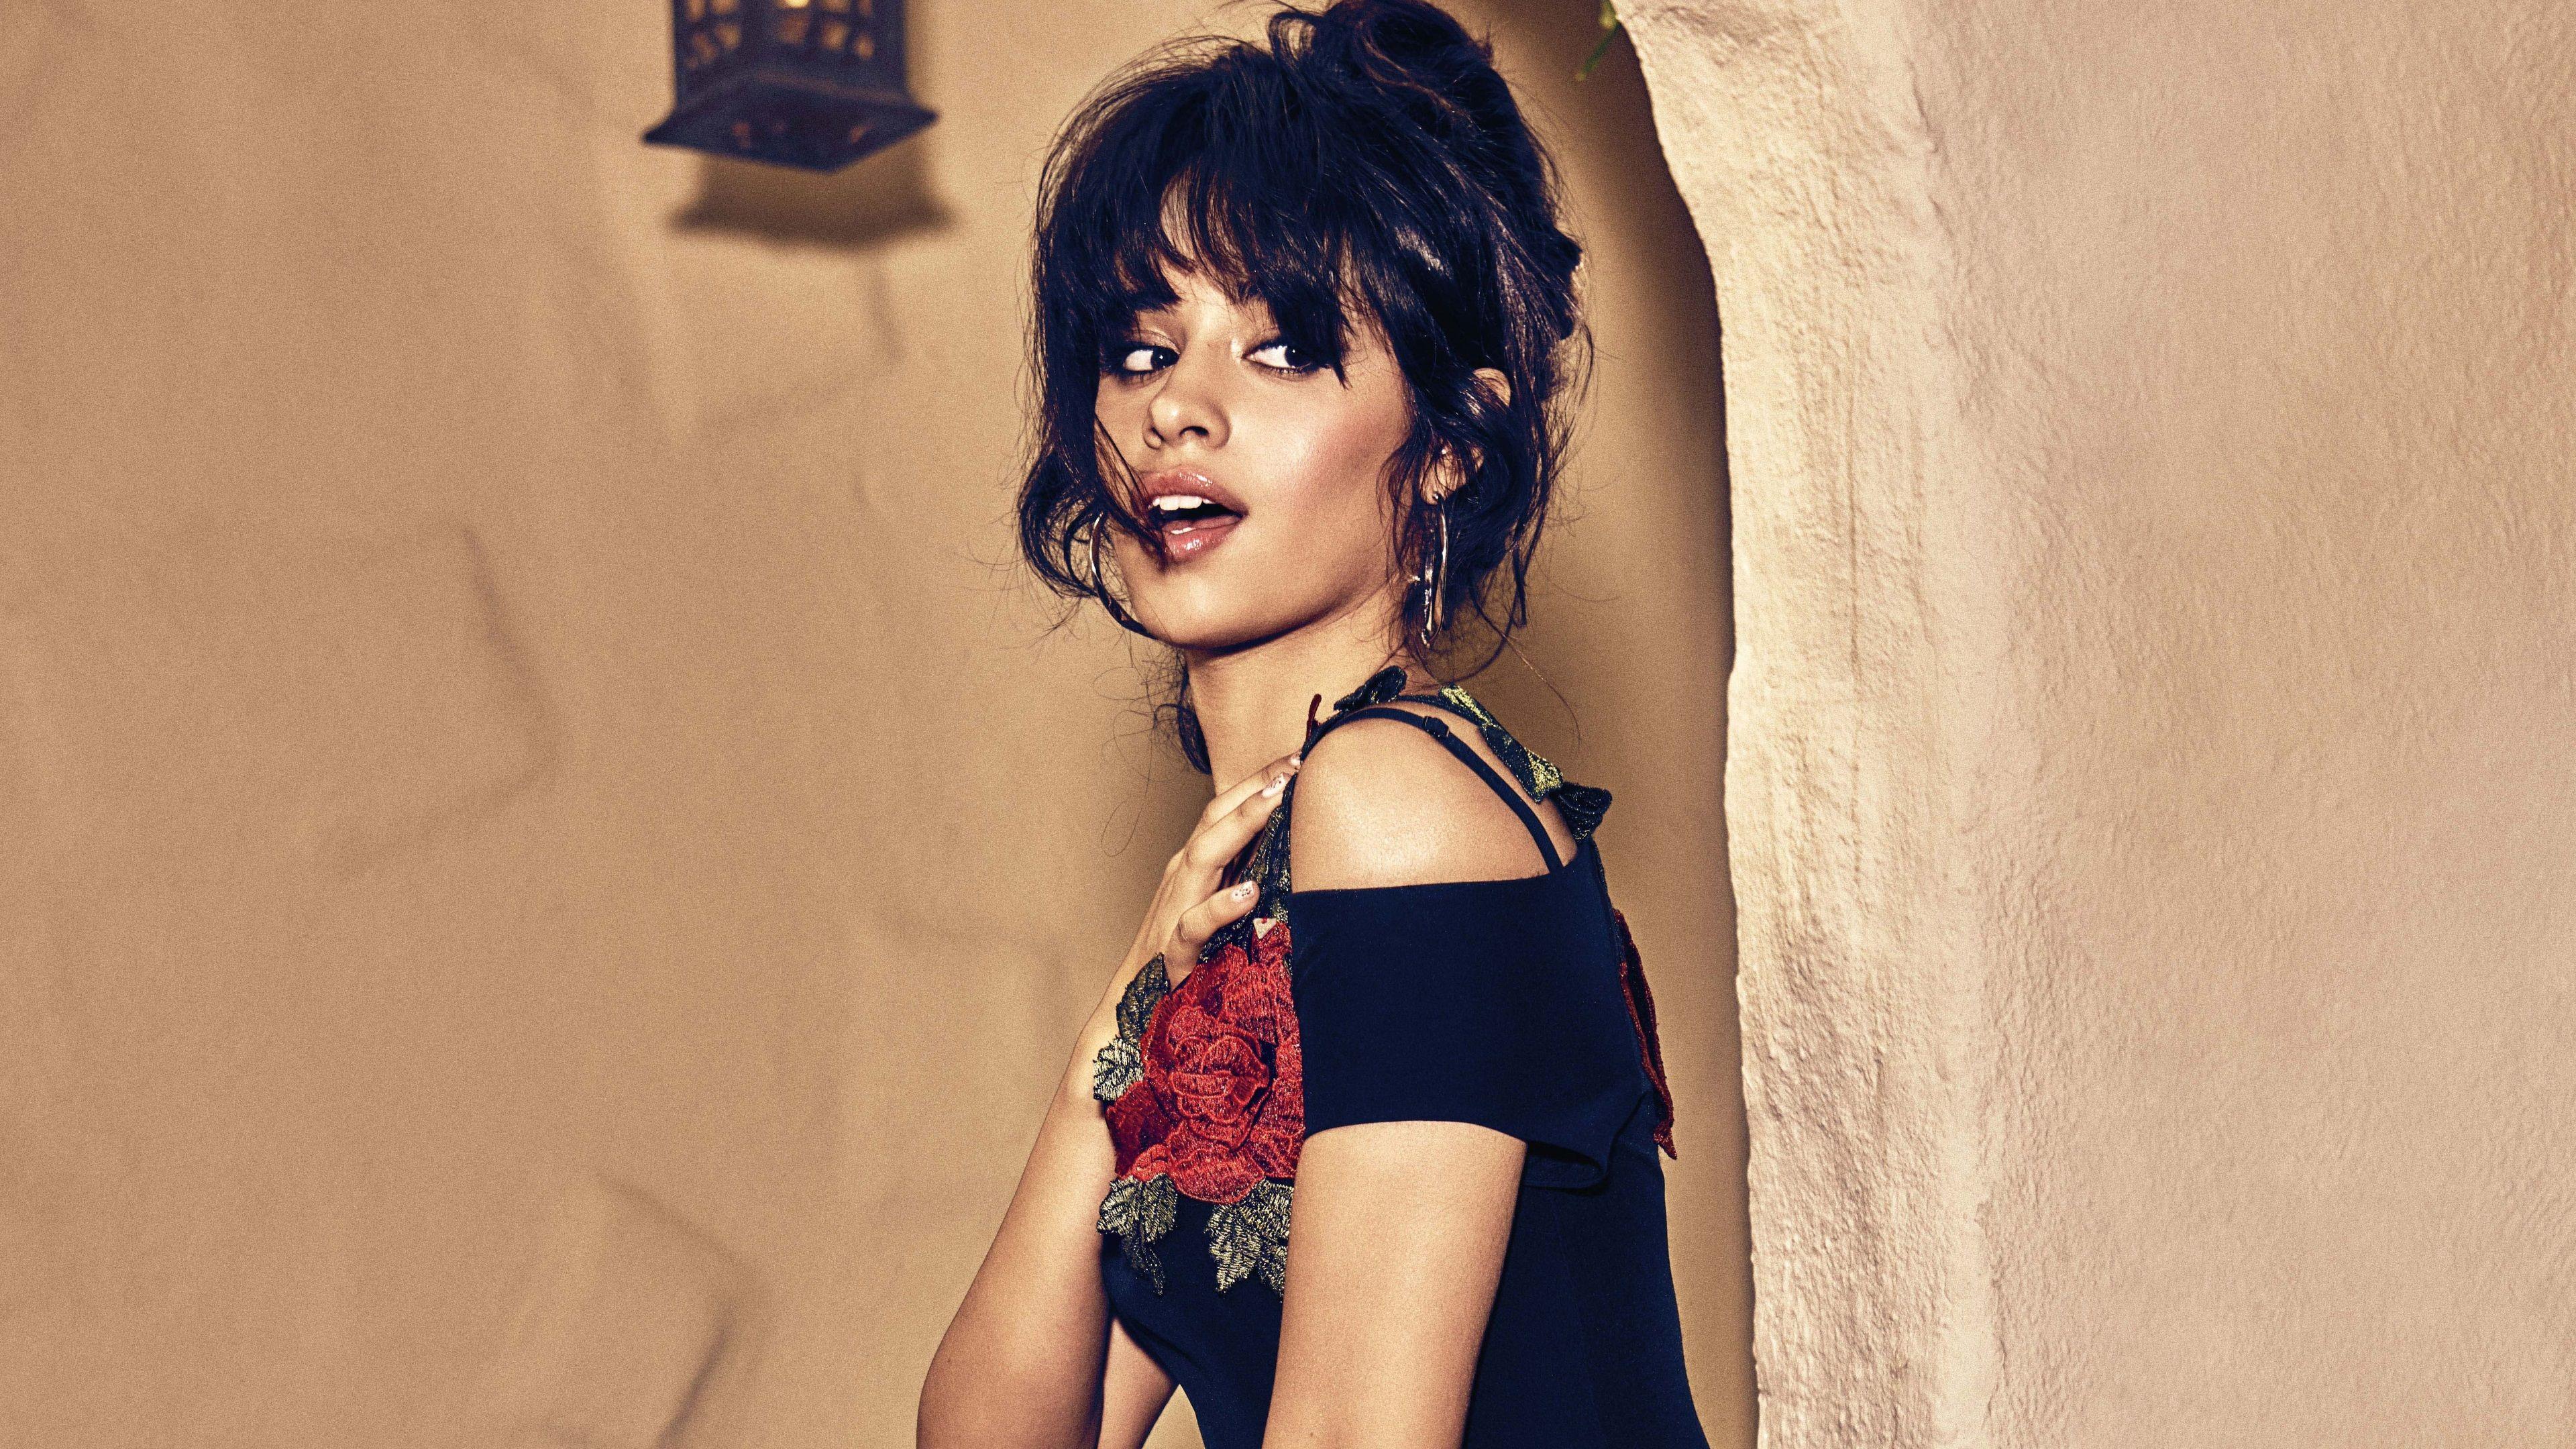 3840x2160 Camila Cabello 4k Pc Desktop Wallpaper Hd Camila Cabello This Love Lyrics Celebrities